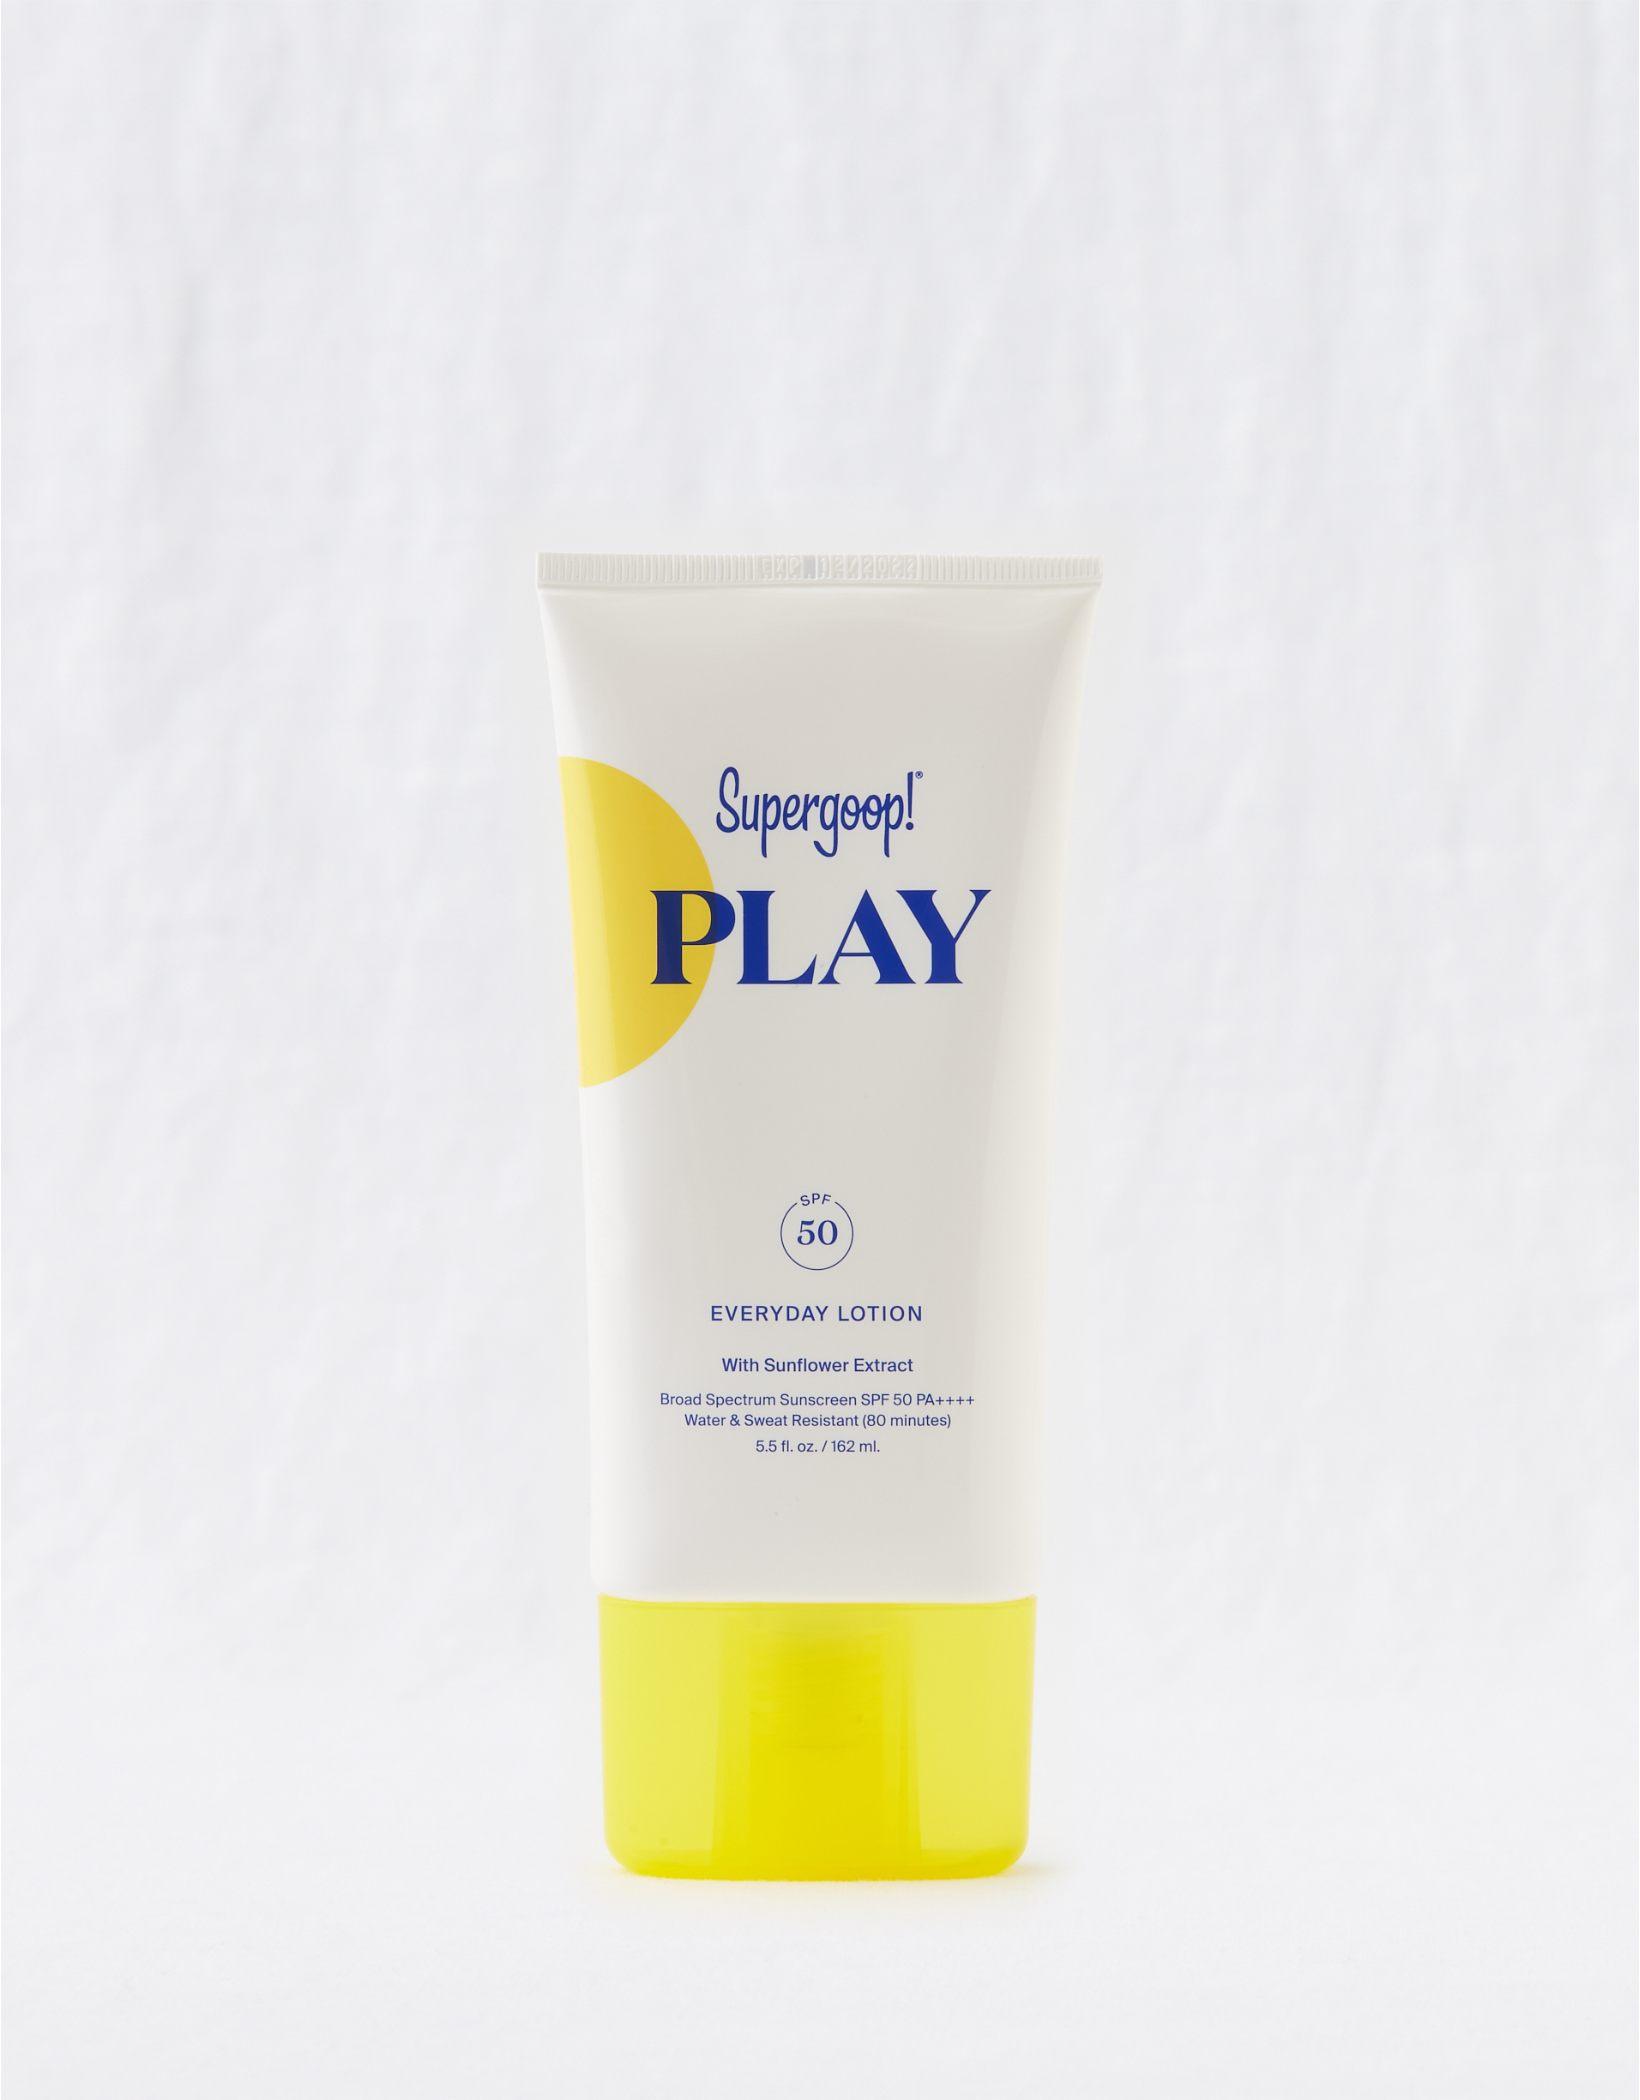 Supergoop!® Play Everyday Lotion SPF 50 5.5 Oz